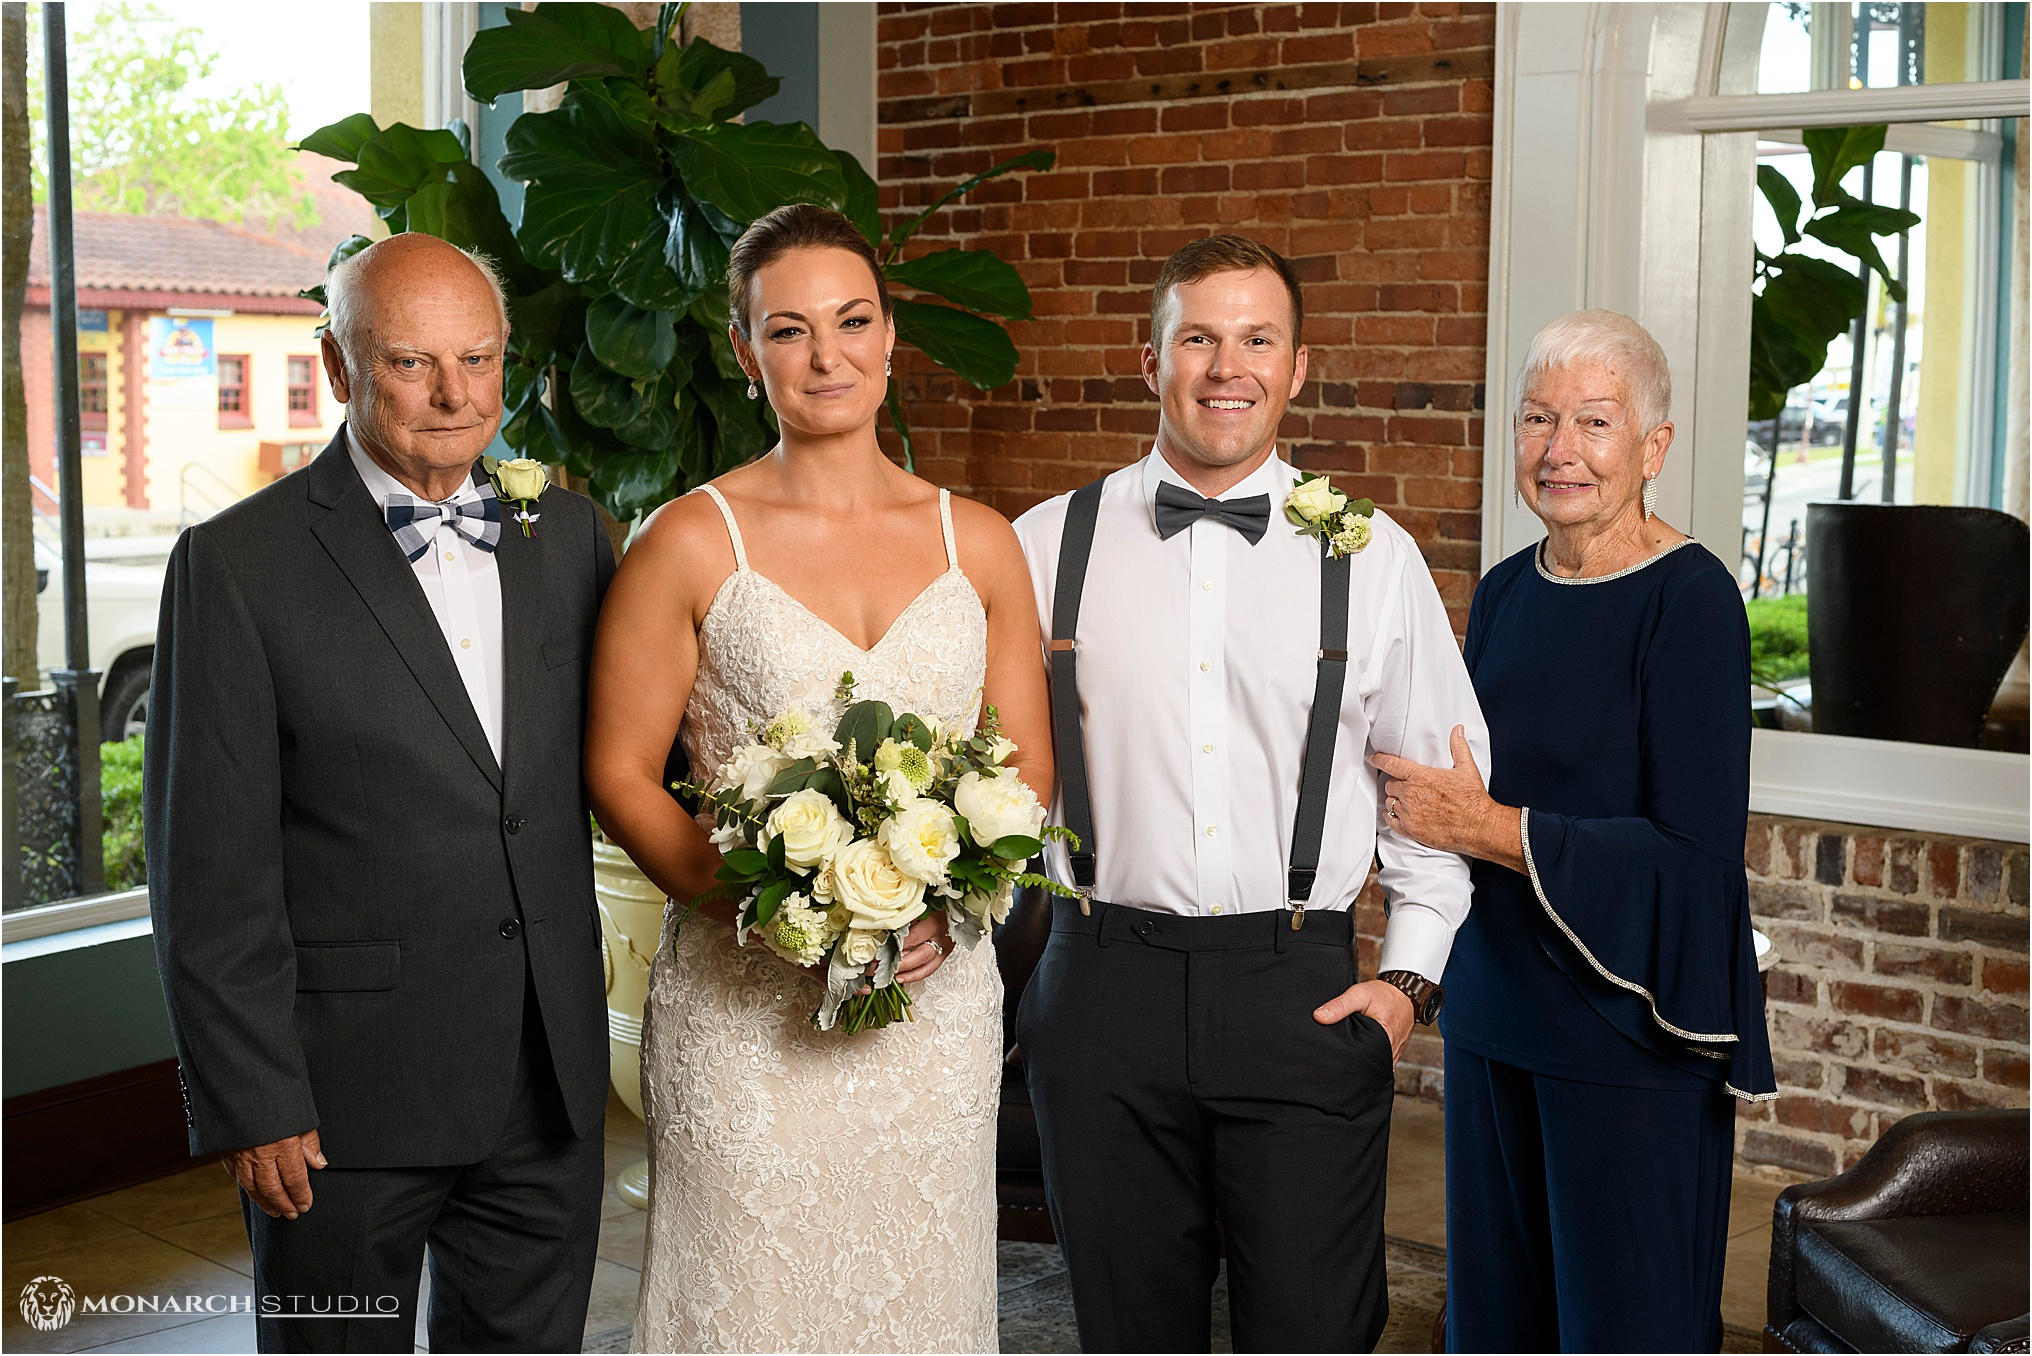 083-whiteroom-wedding-photographer-2019-05-22_0065.jpg